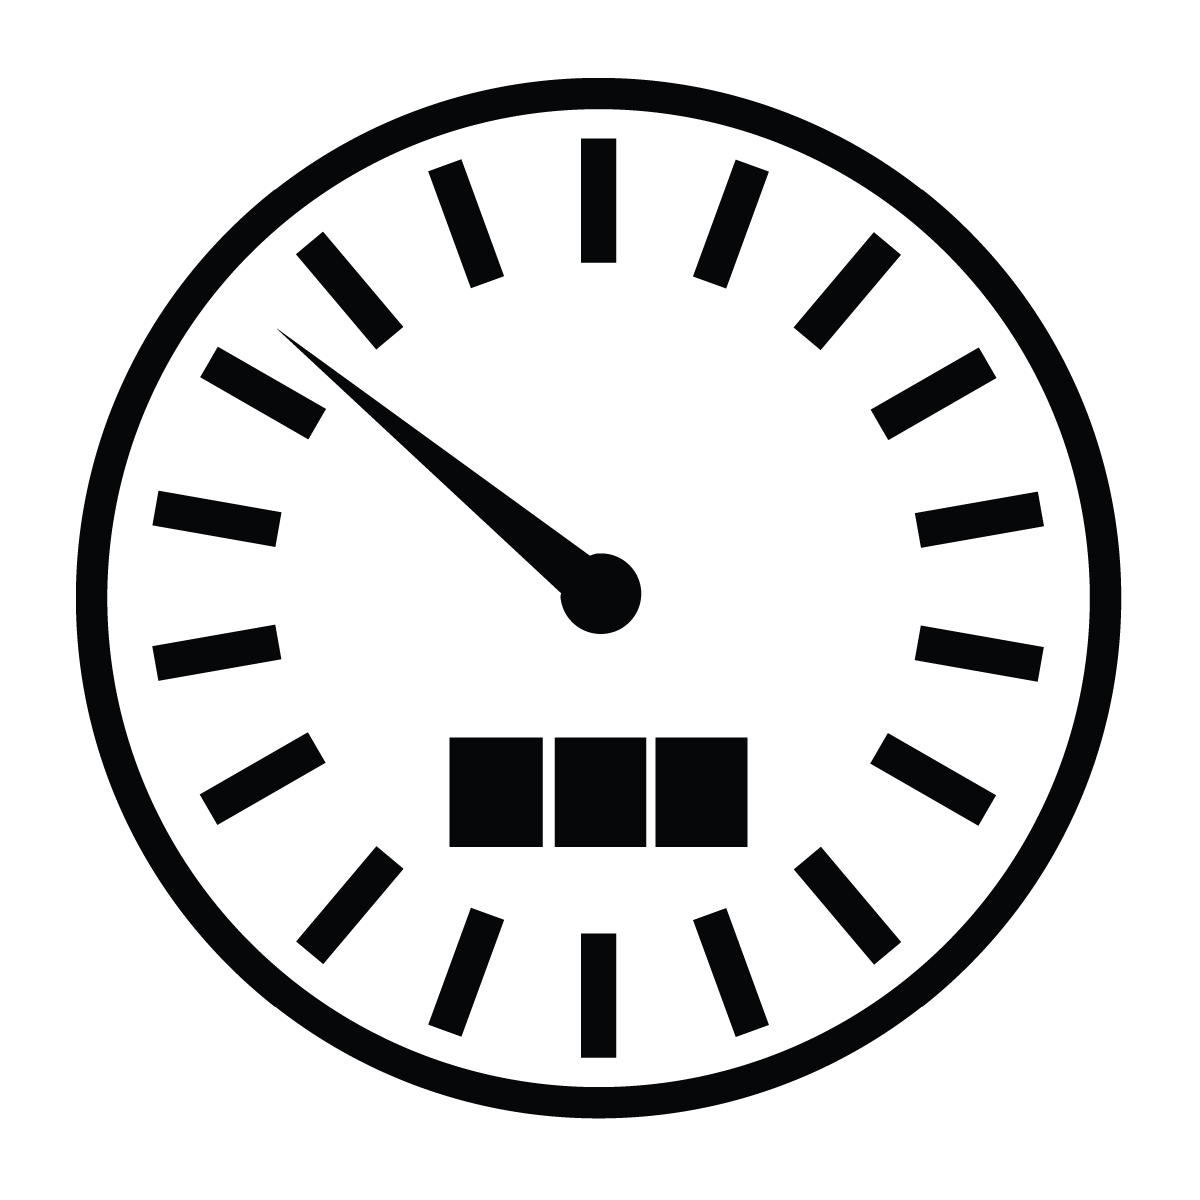 Power Meter Clip Art : Png meter transparent images pluspng